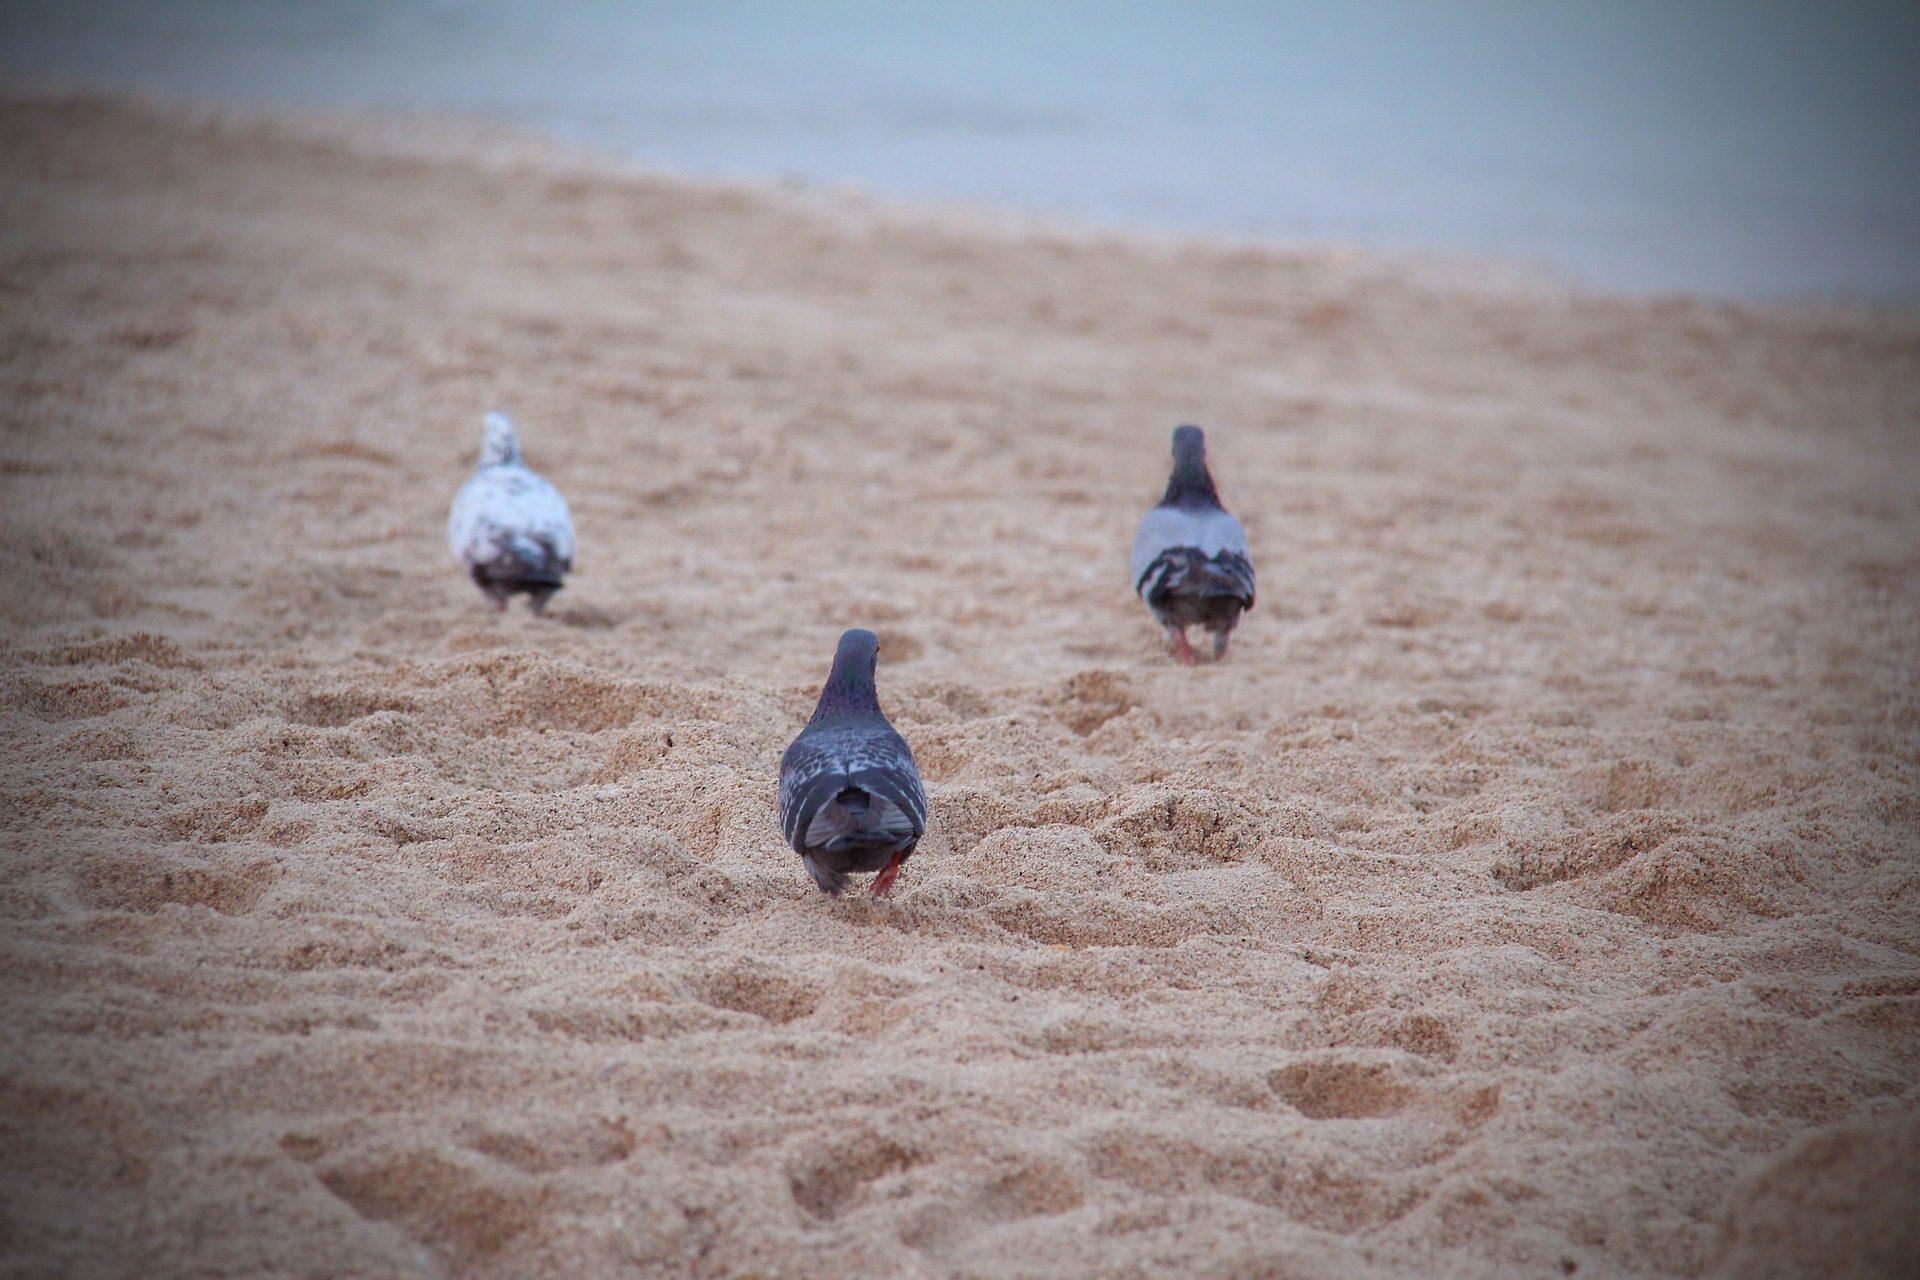 pombos, pájaros, aves, Praia, areia - Papéis de parede HD - Professor-falken.com